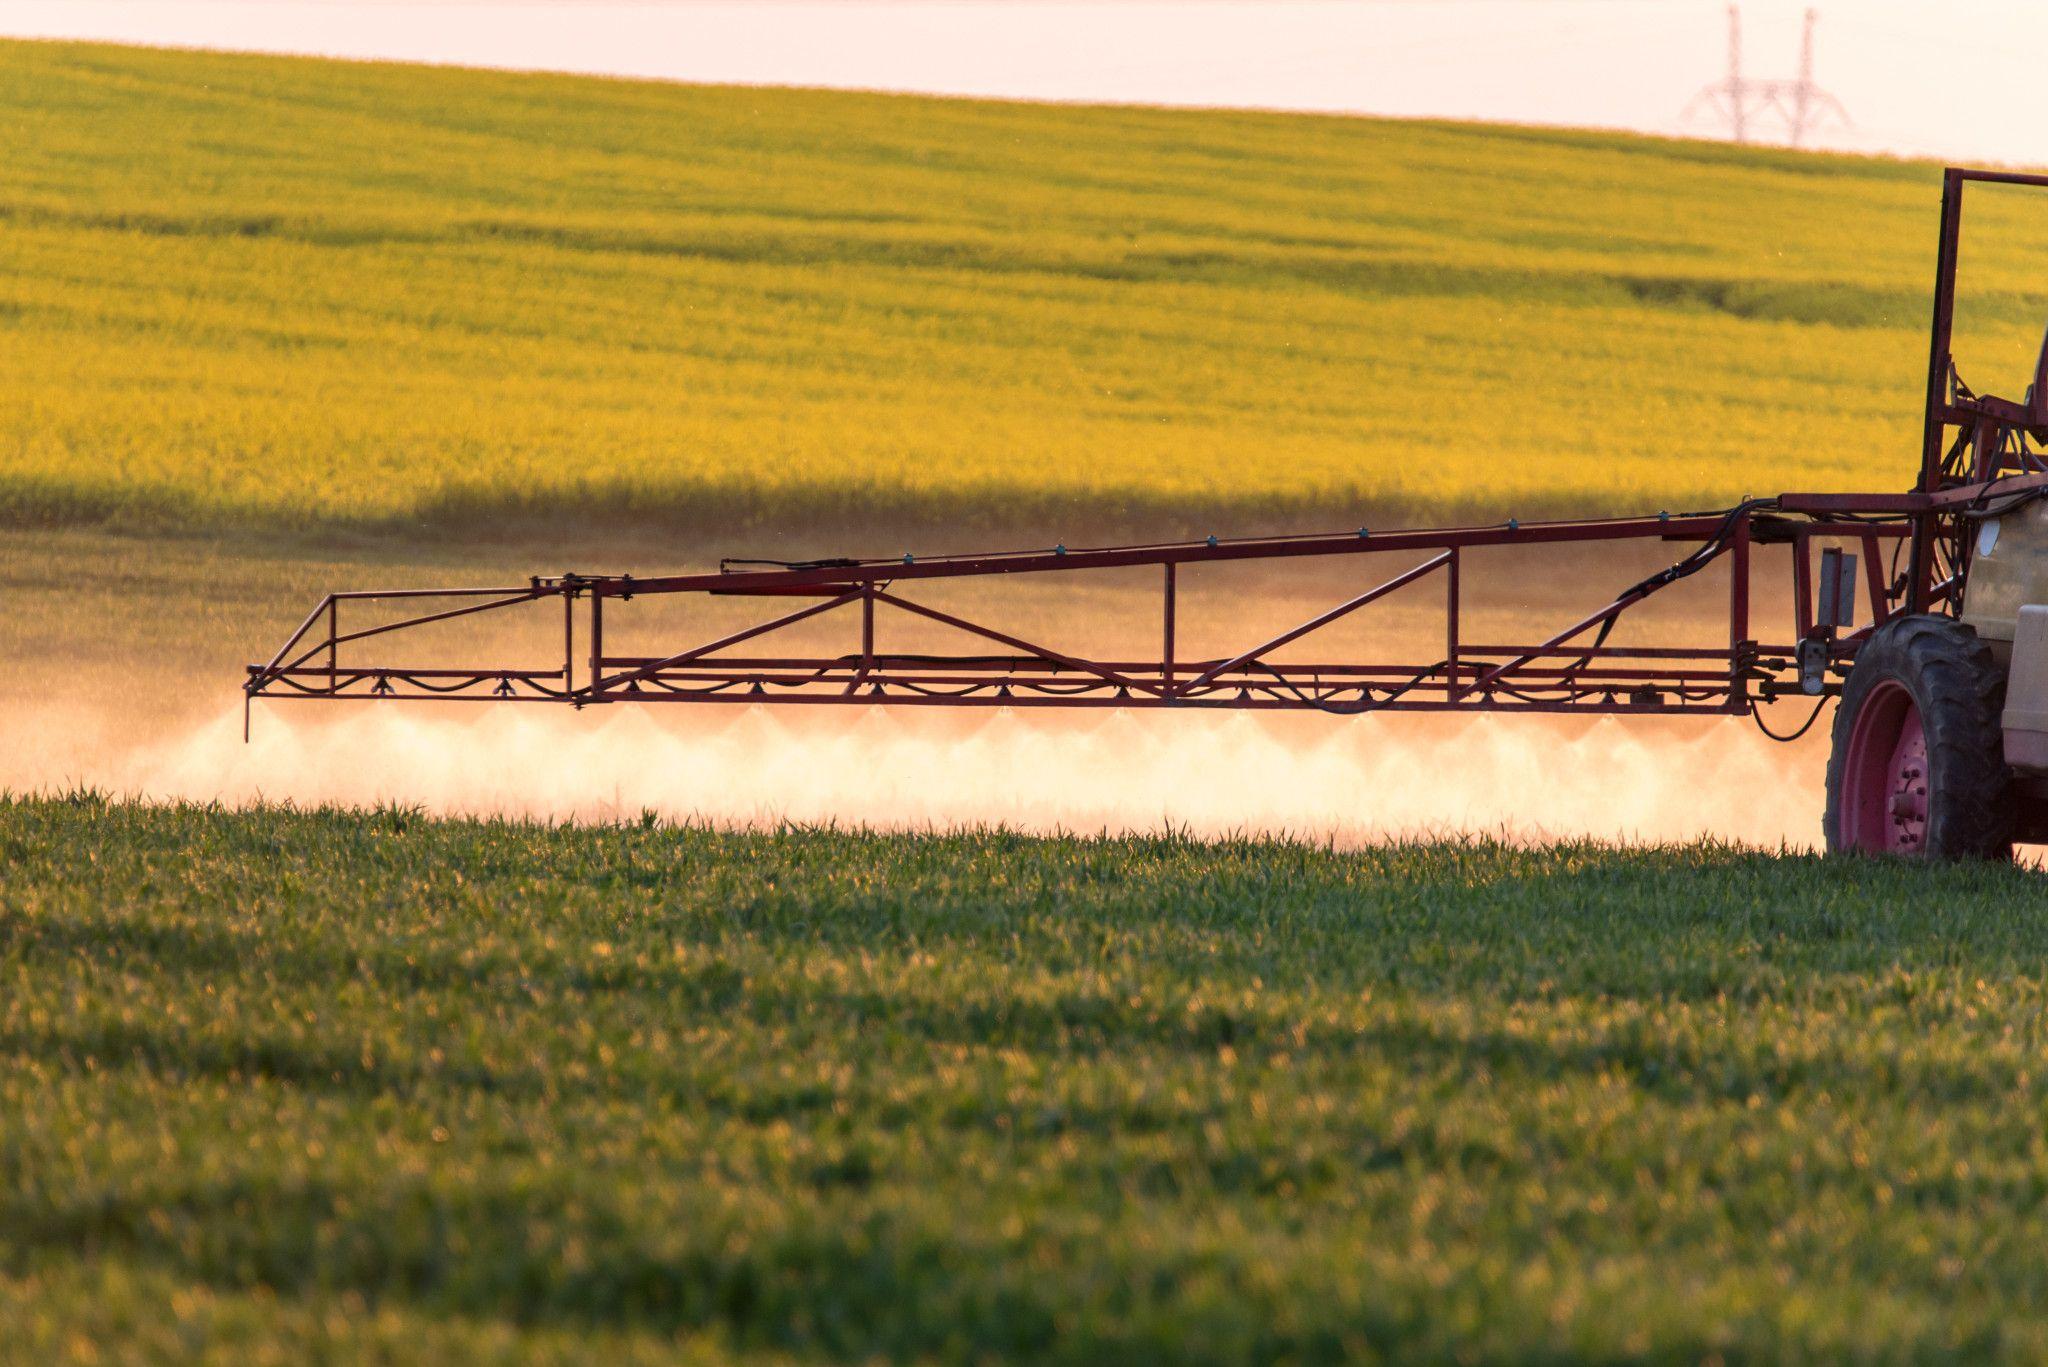 spraying machine working on the green field